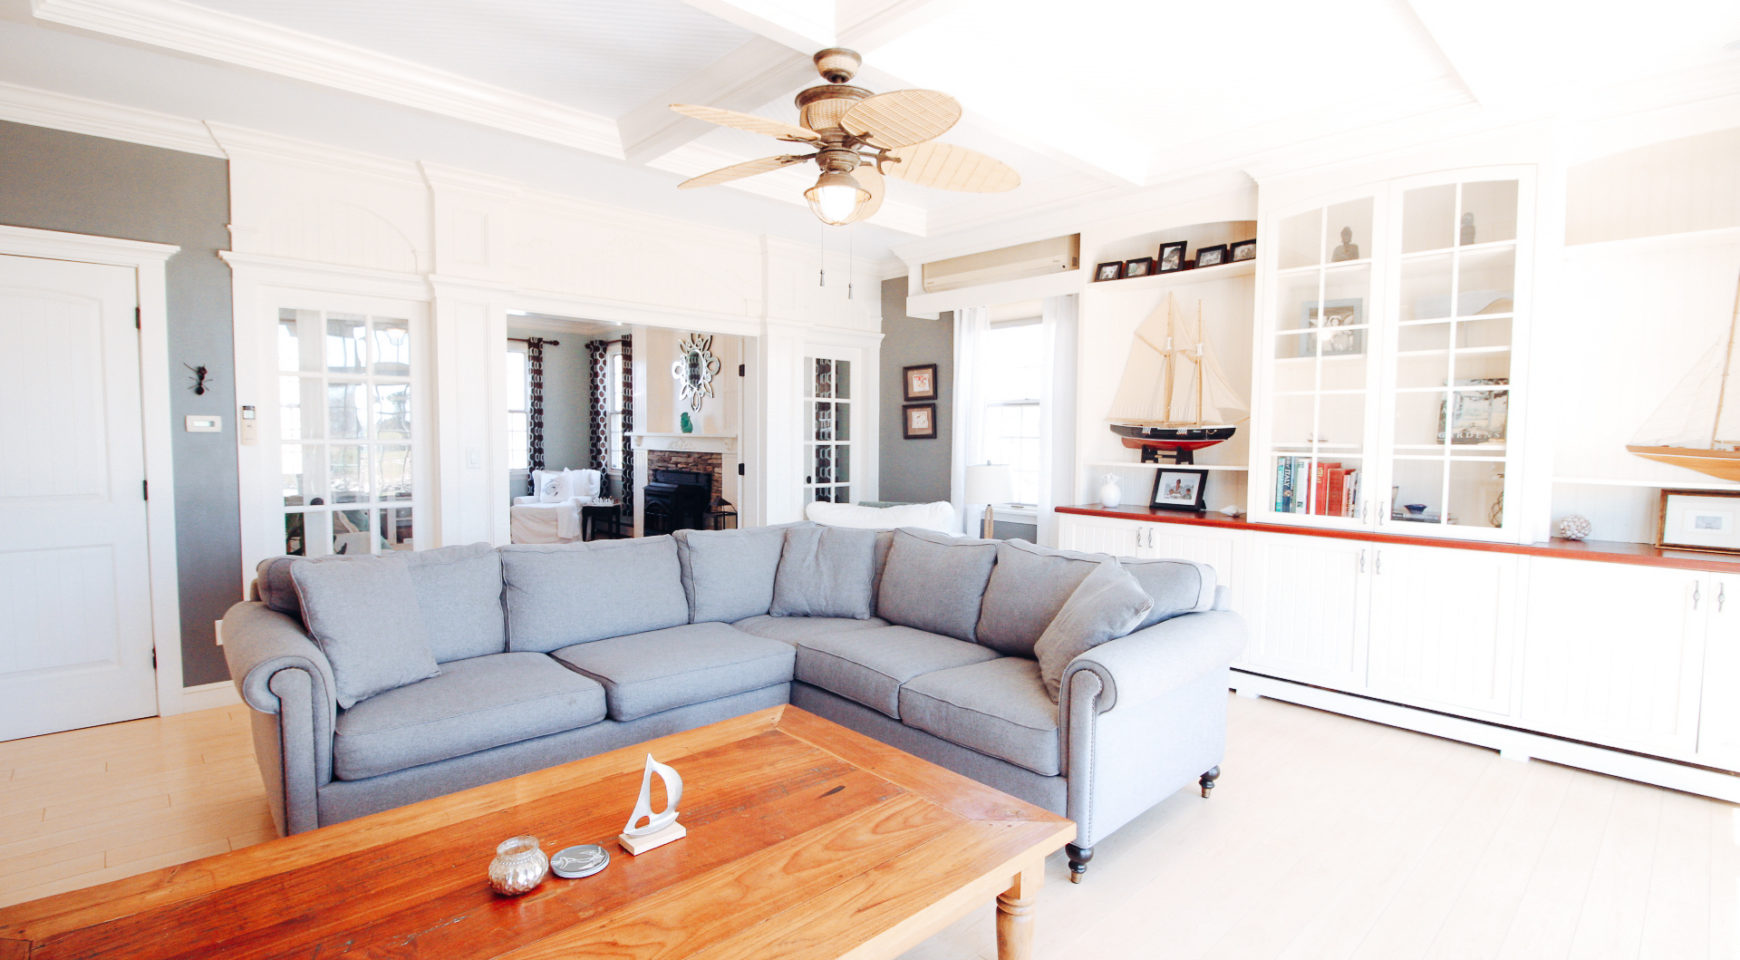 Luxe_and_Livable_Interior_Design_Blog_by_Maloney_Interiors_Newport_Rhode_Island_Fitzpatrick_Team_Remax_22.jpg